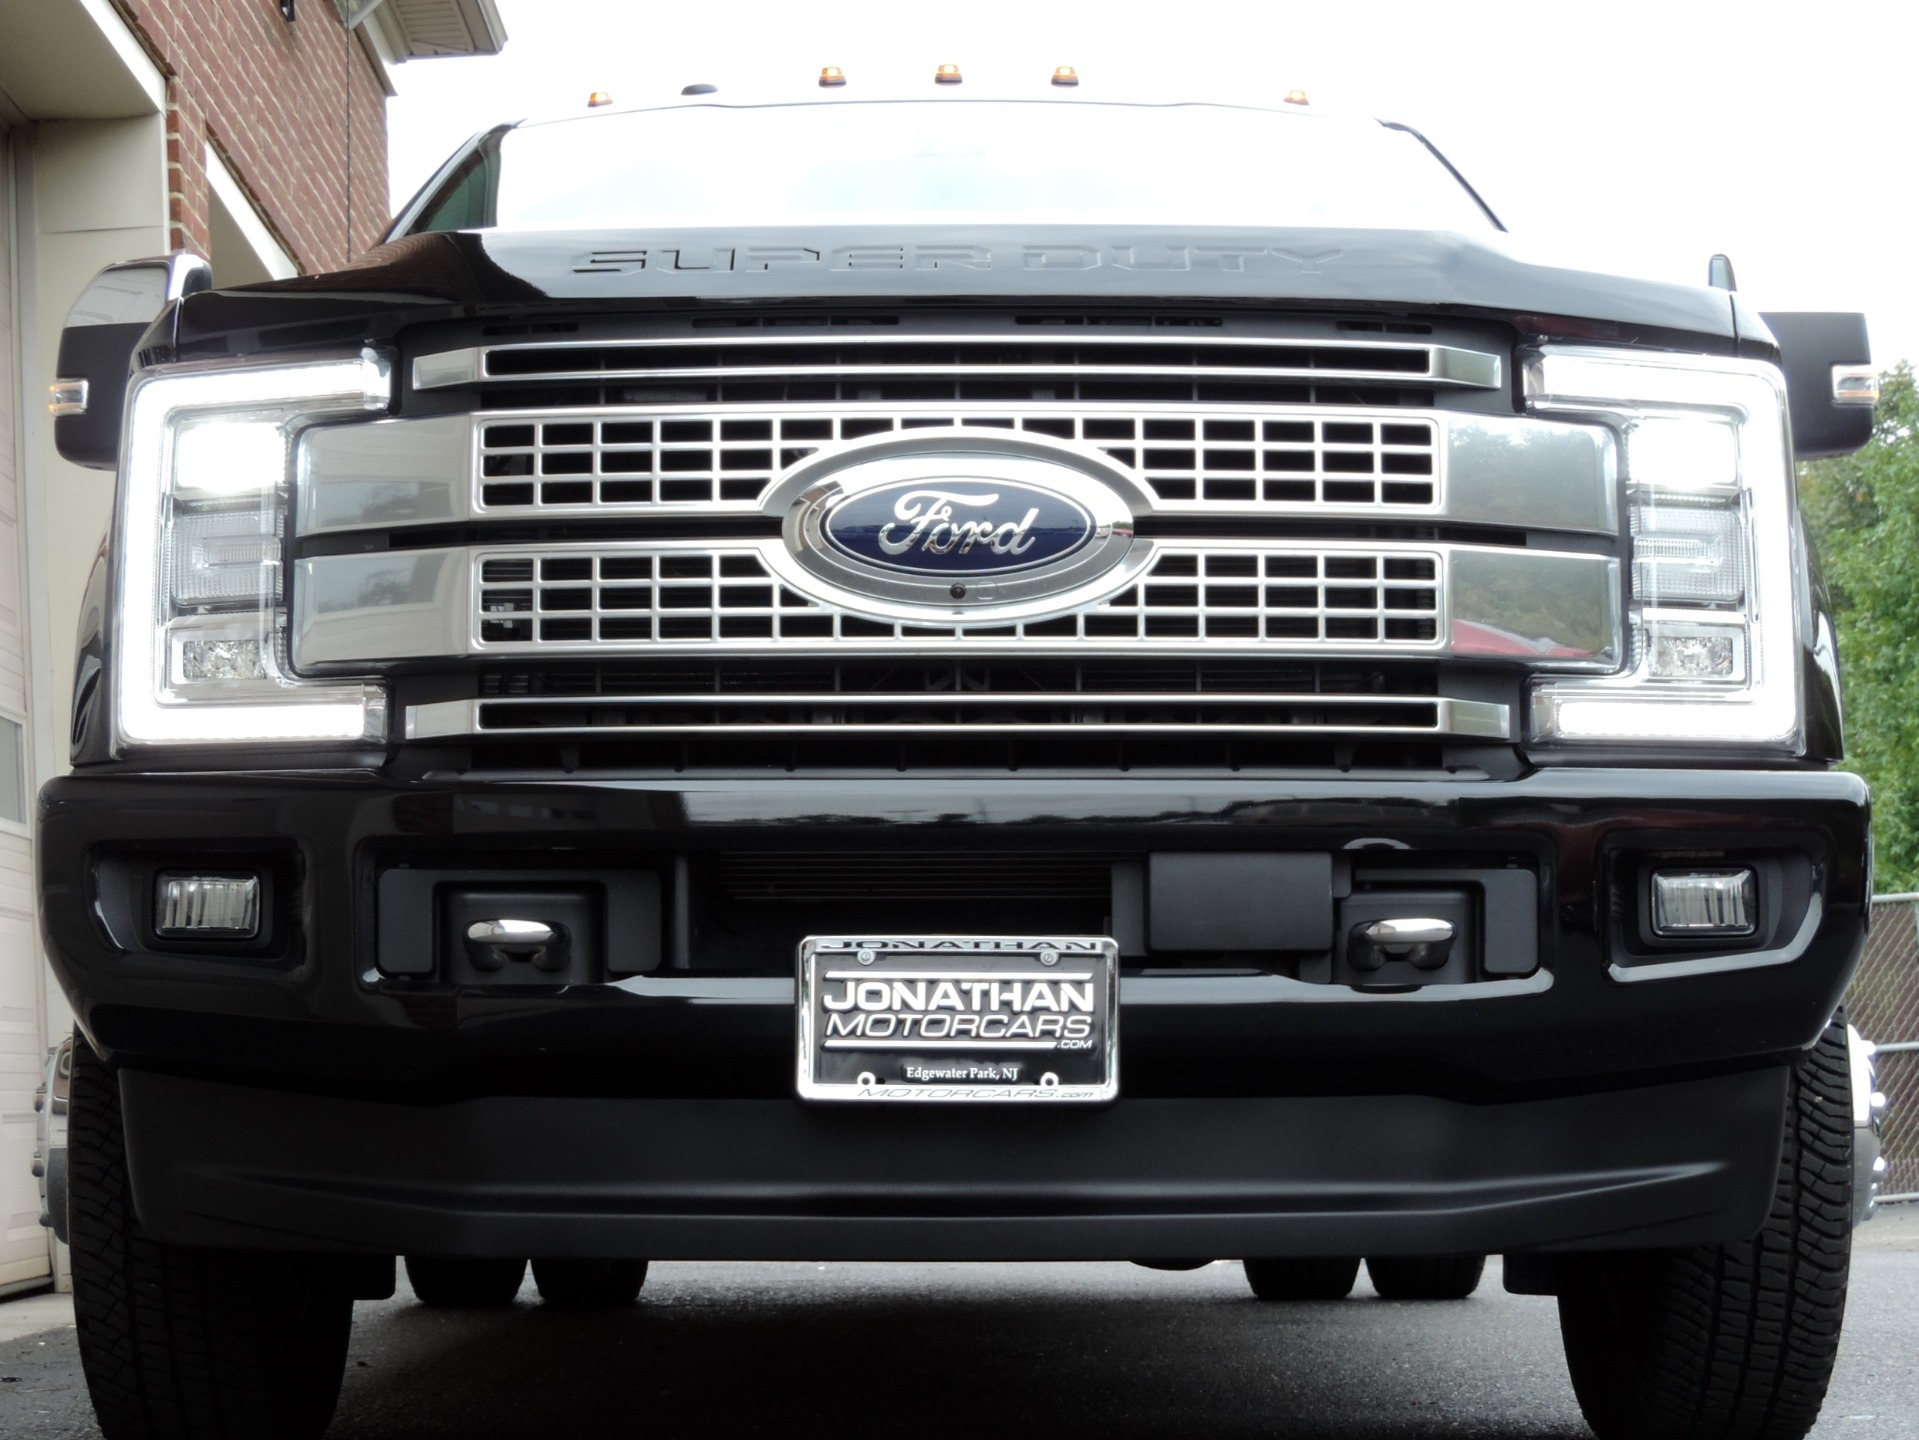 Used-2018-Ford-F-350-Super-Duty-Platinum